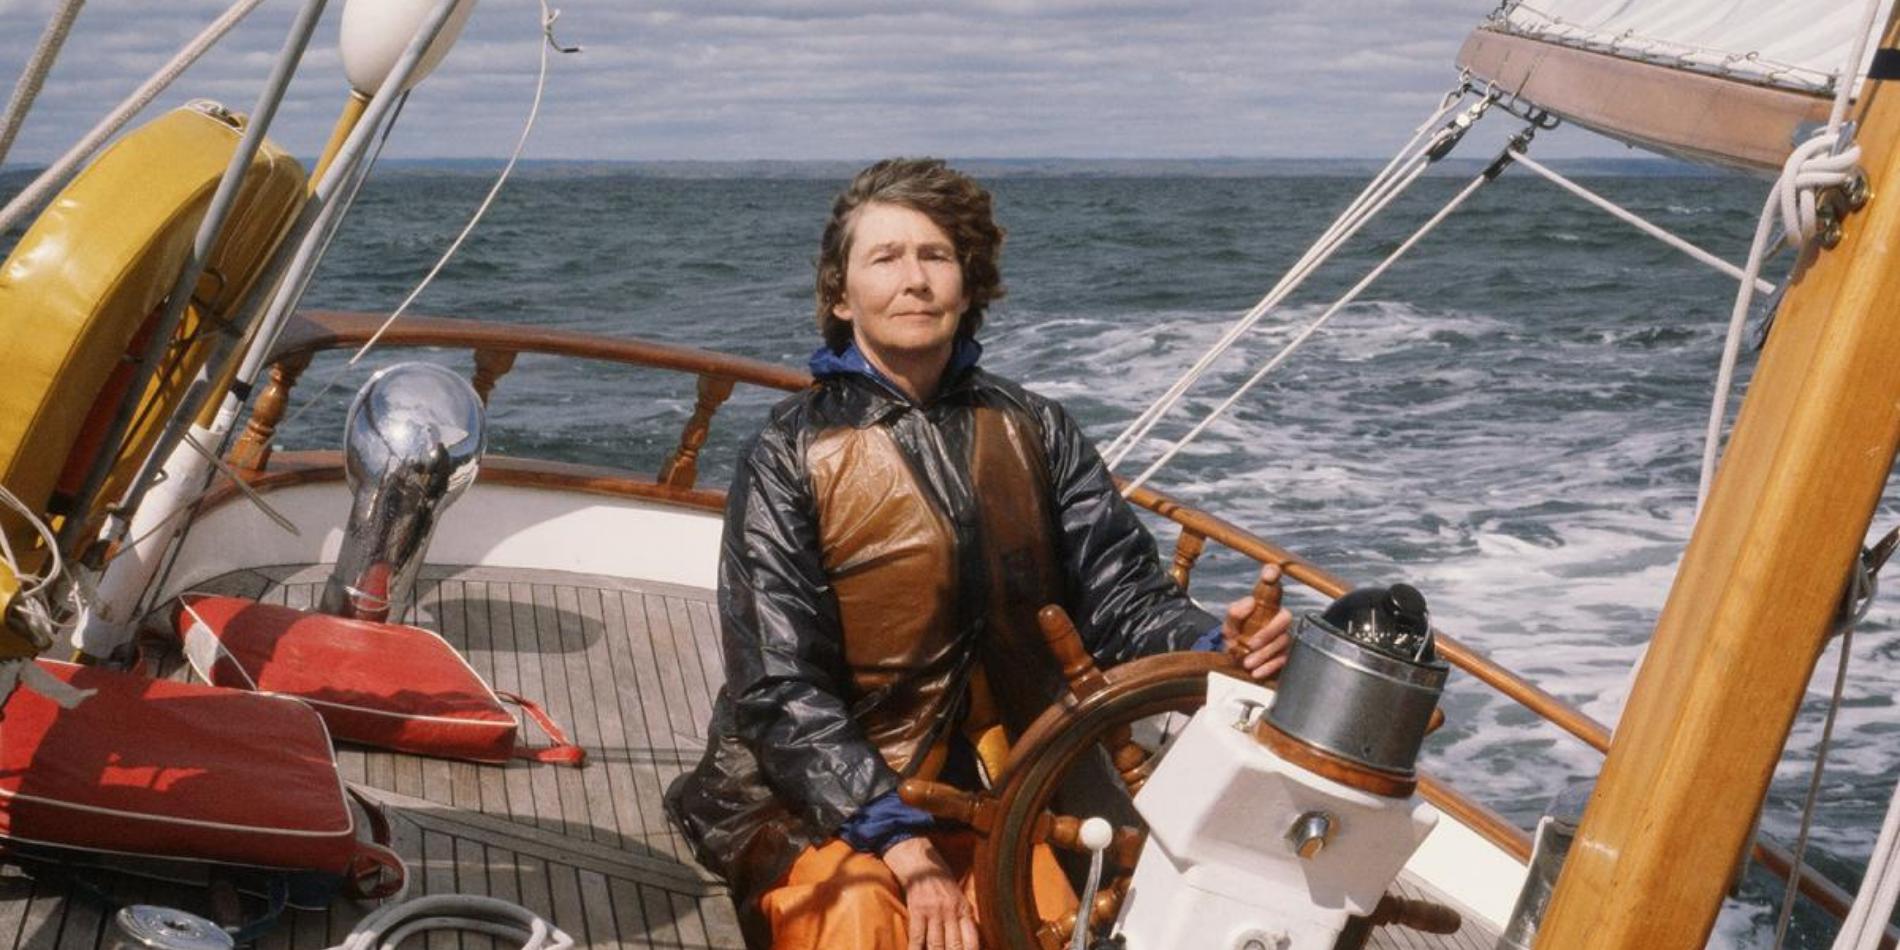 A woman drives a sailboat